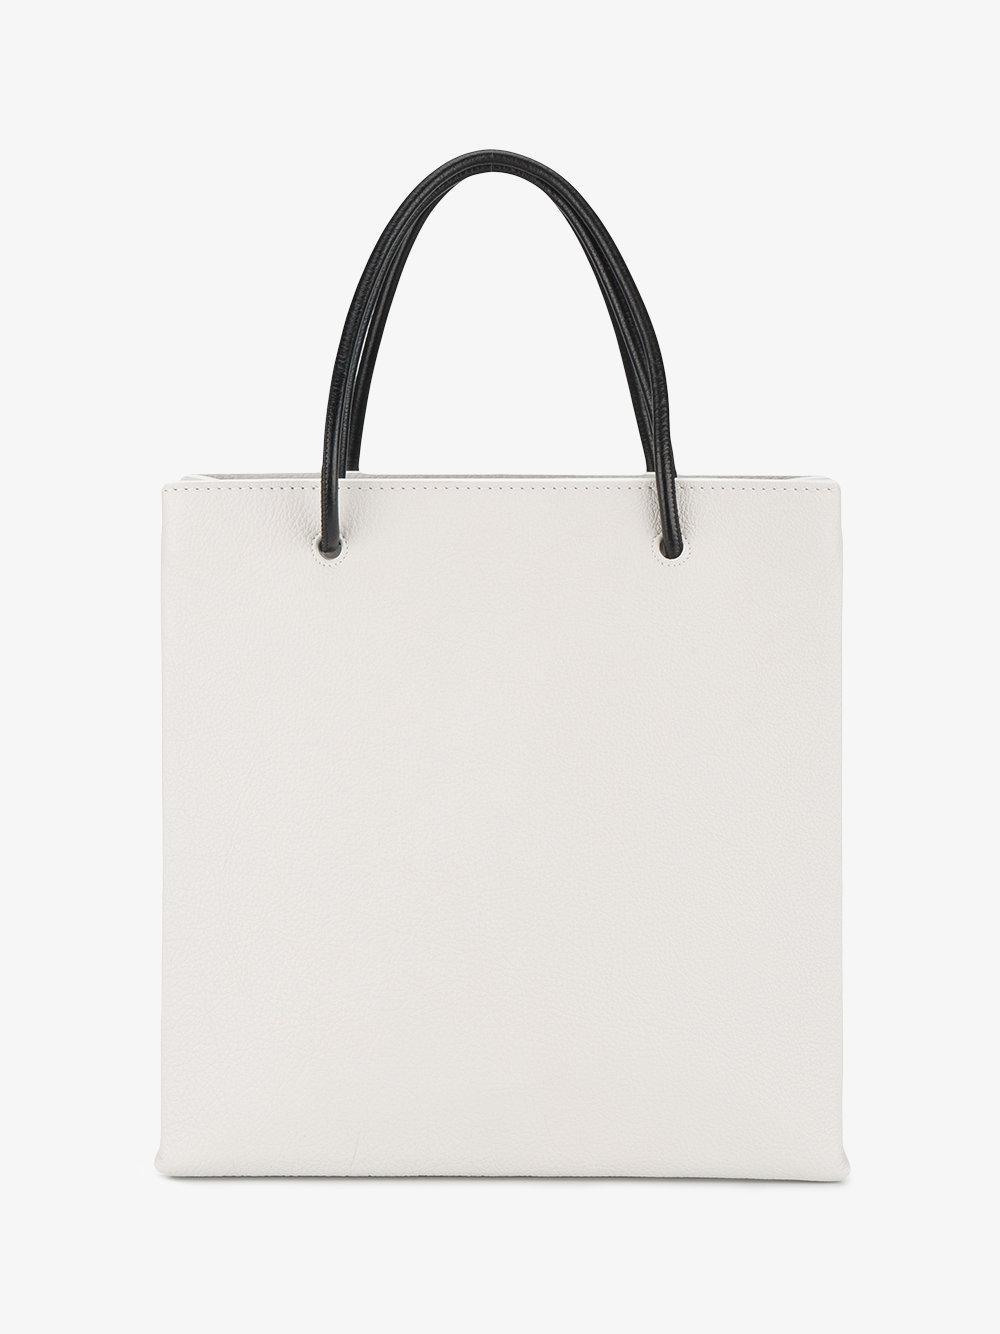 Balenciaga Leather Small White Shopping Tote Bag in Black